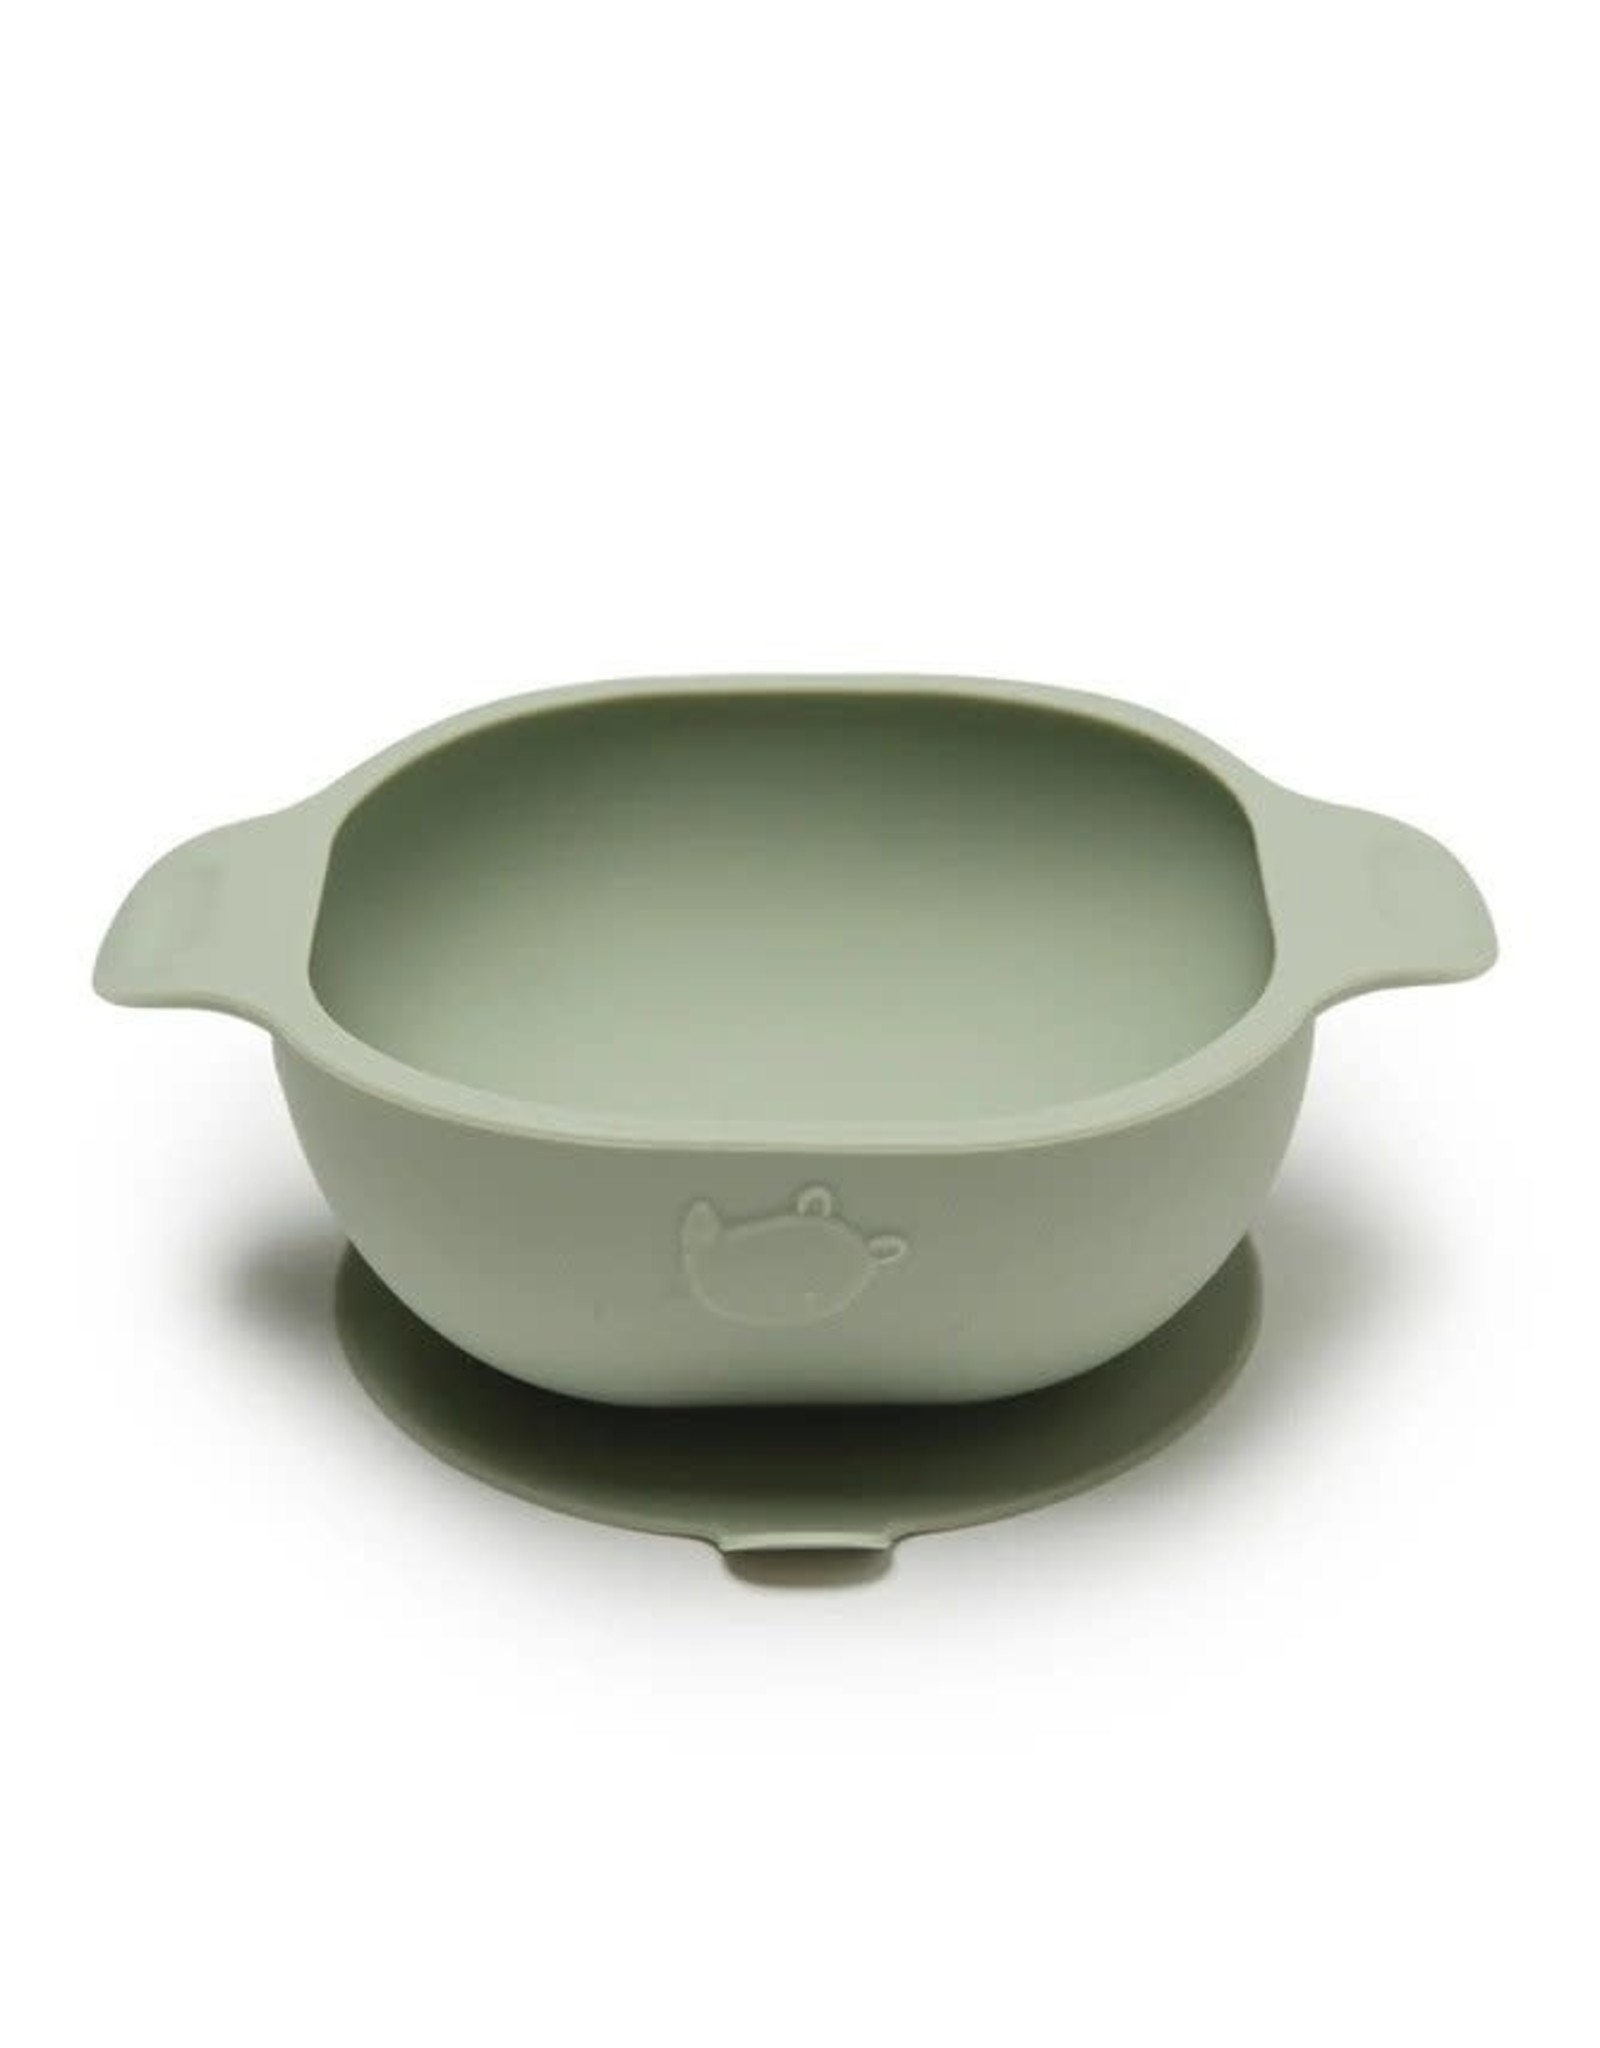 Loulou Lollipop Silicone Bowl - Sage